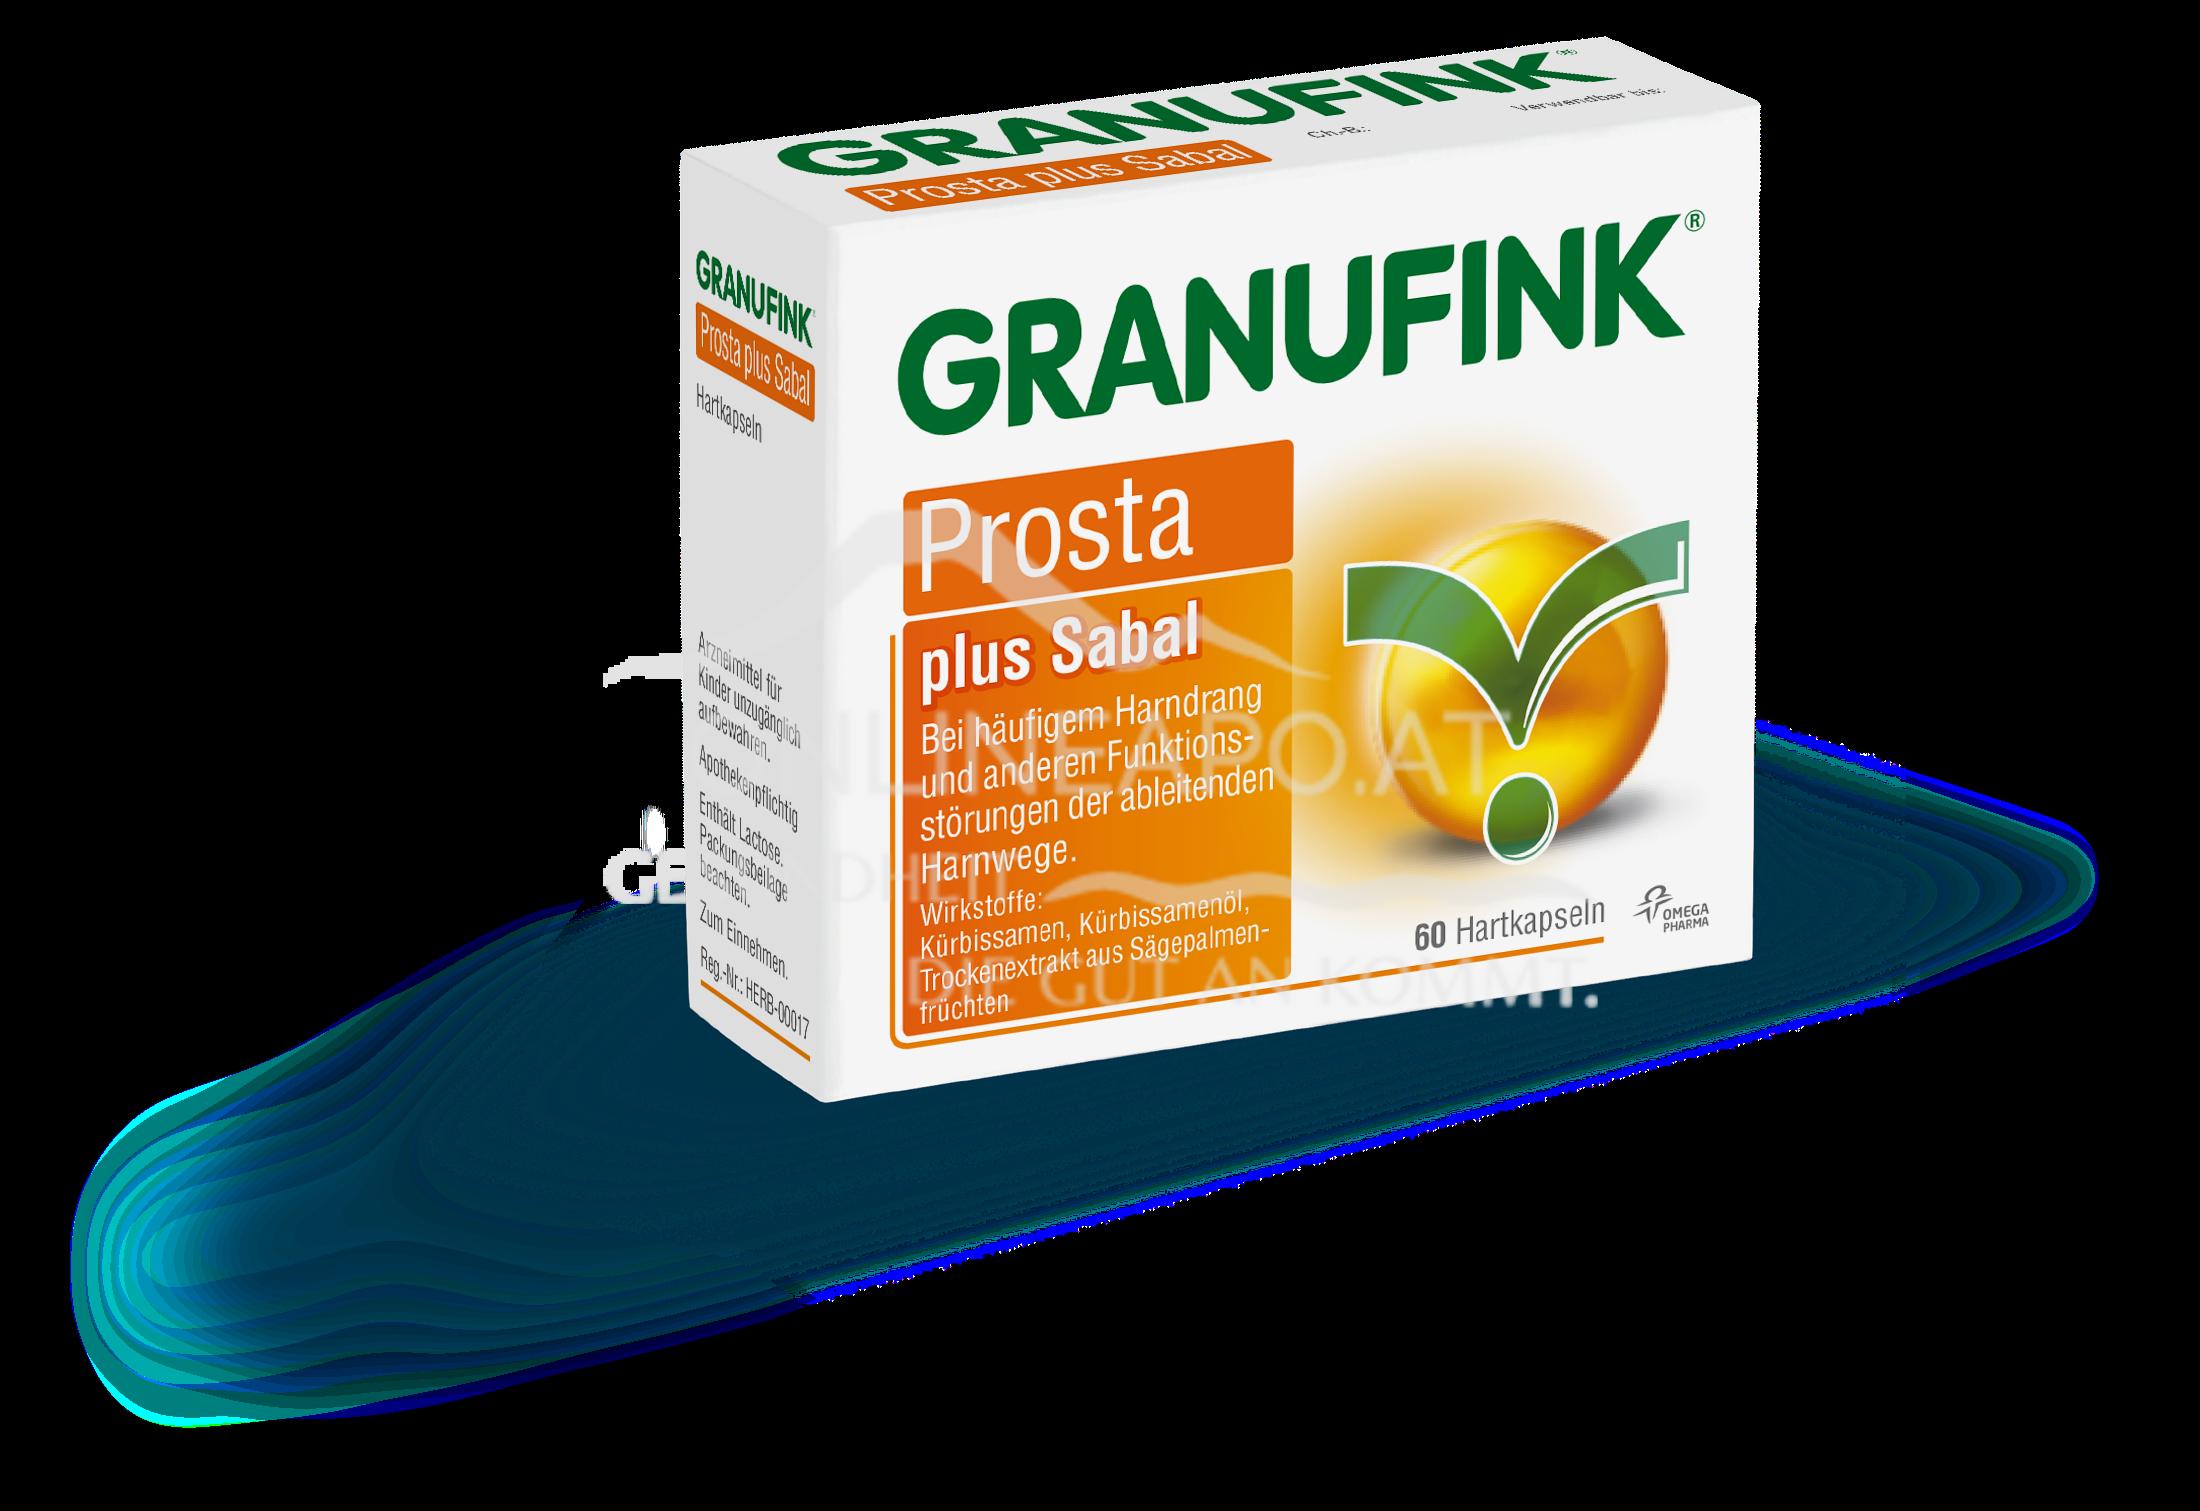 Granufink Prosta plus Sabal